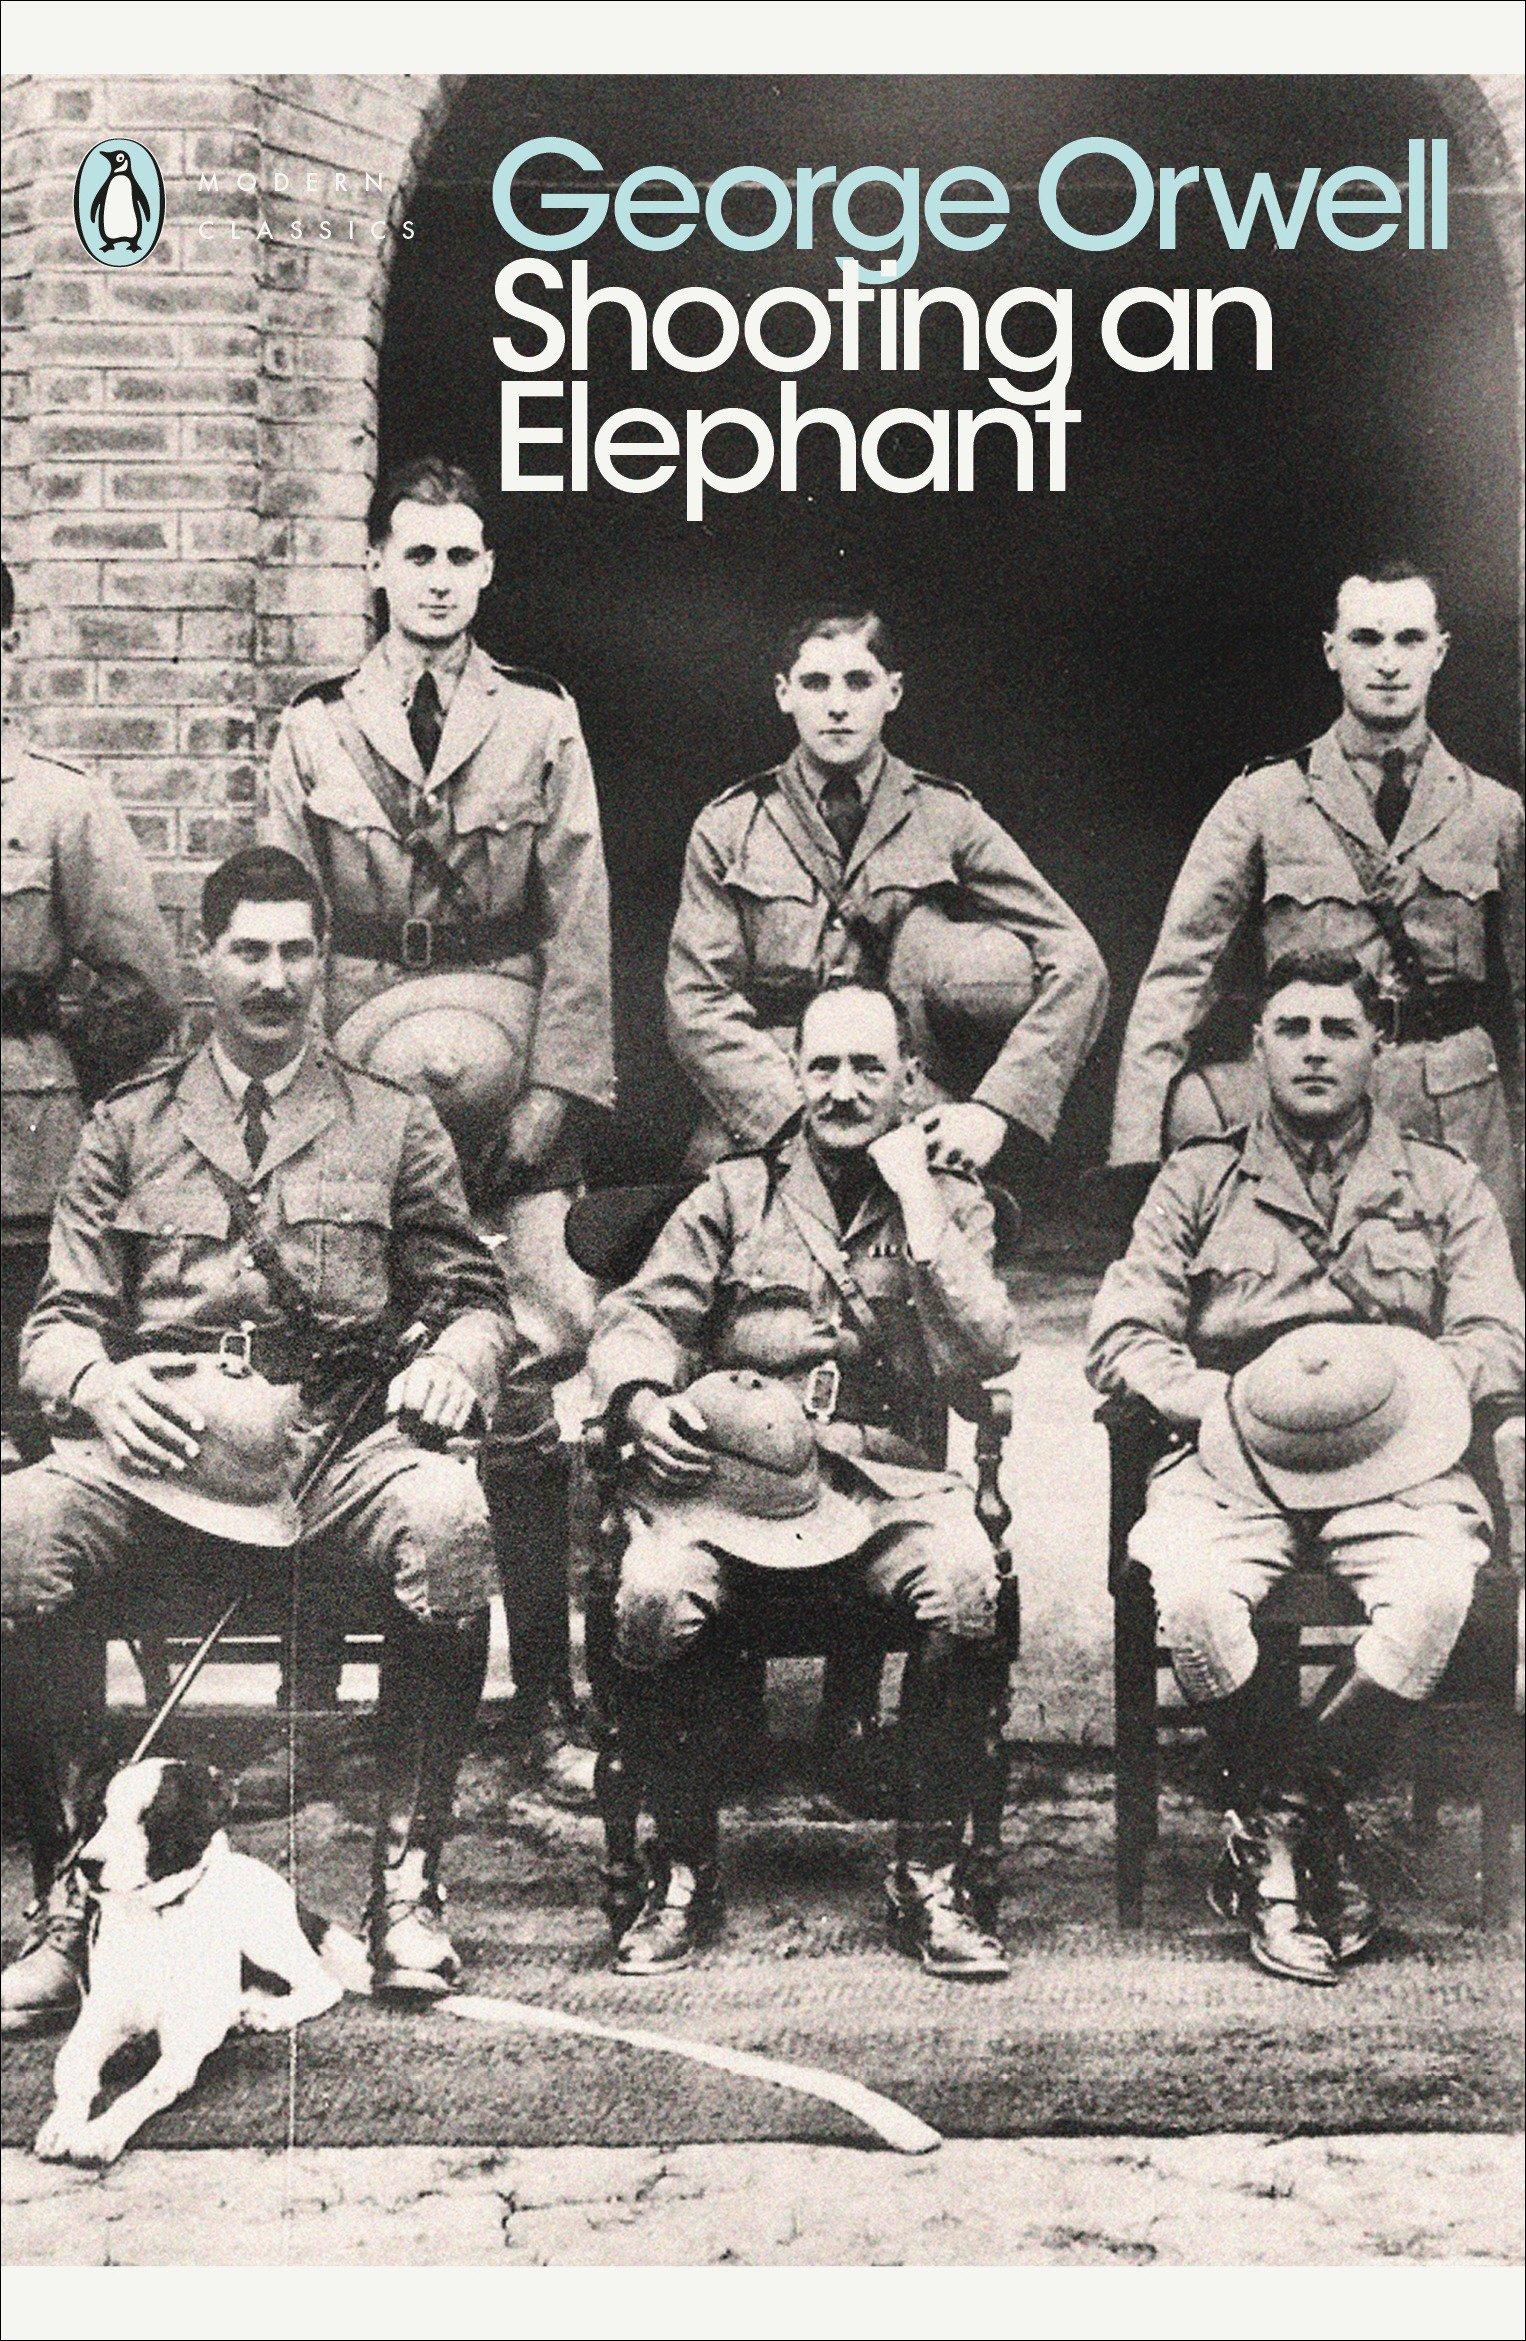 018 Essay Example George Orwell Essays Frightening Everyman's Library Summary Bookshop Memories Full